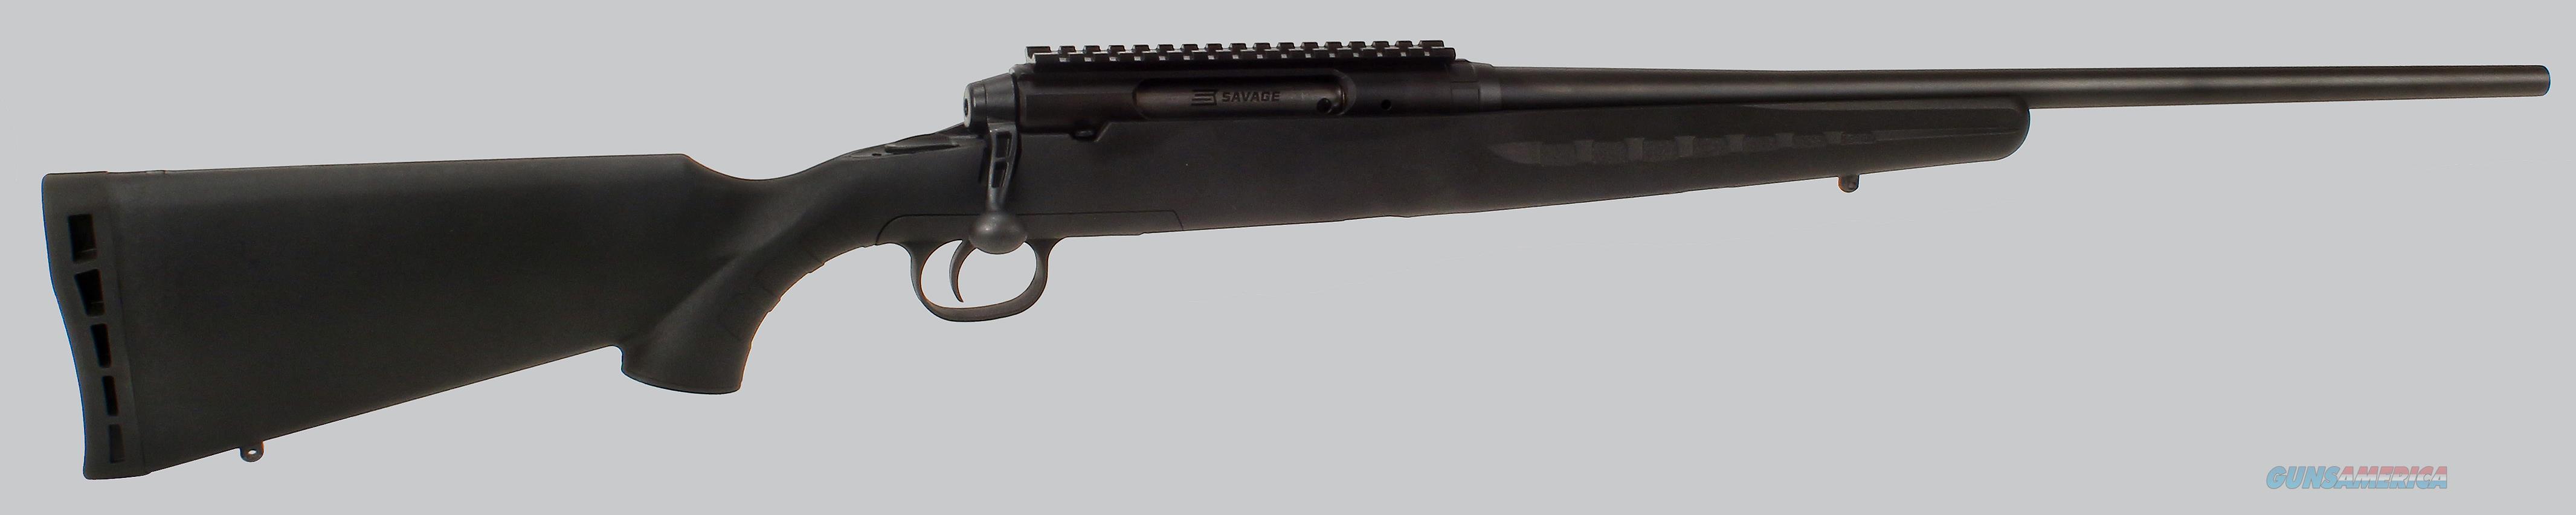 Savage 223 Rem Axis Rifle  Guns > Rifles > Savage Rifles > Axis